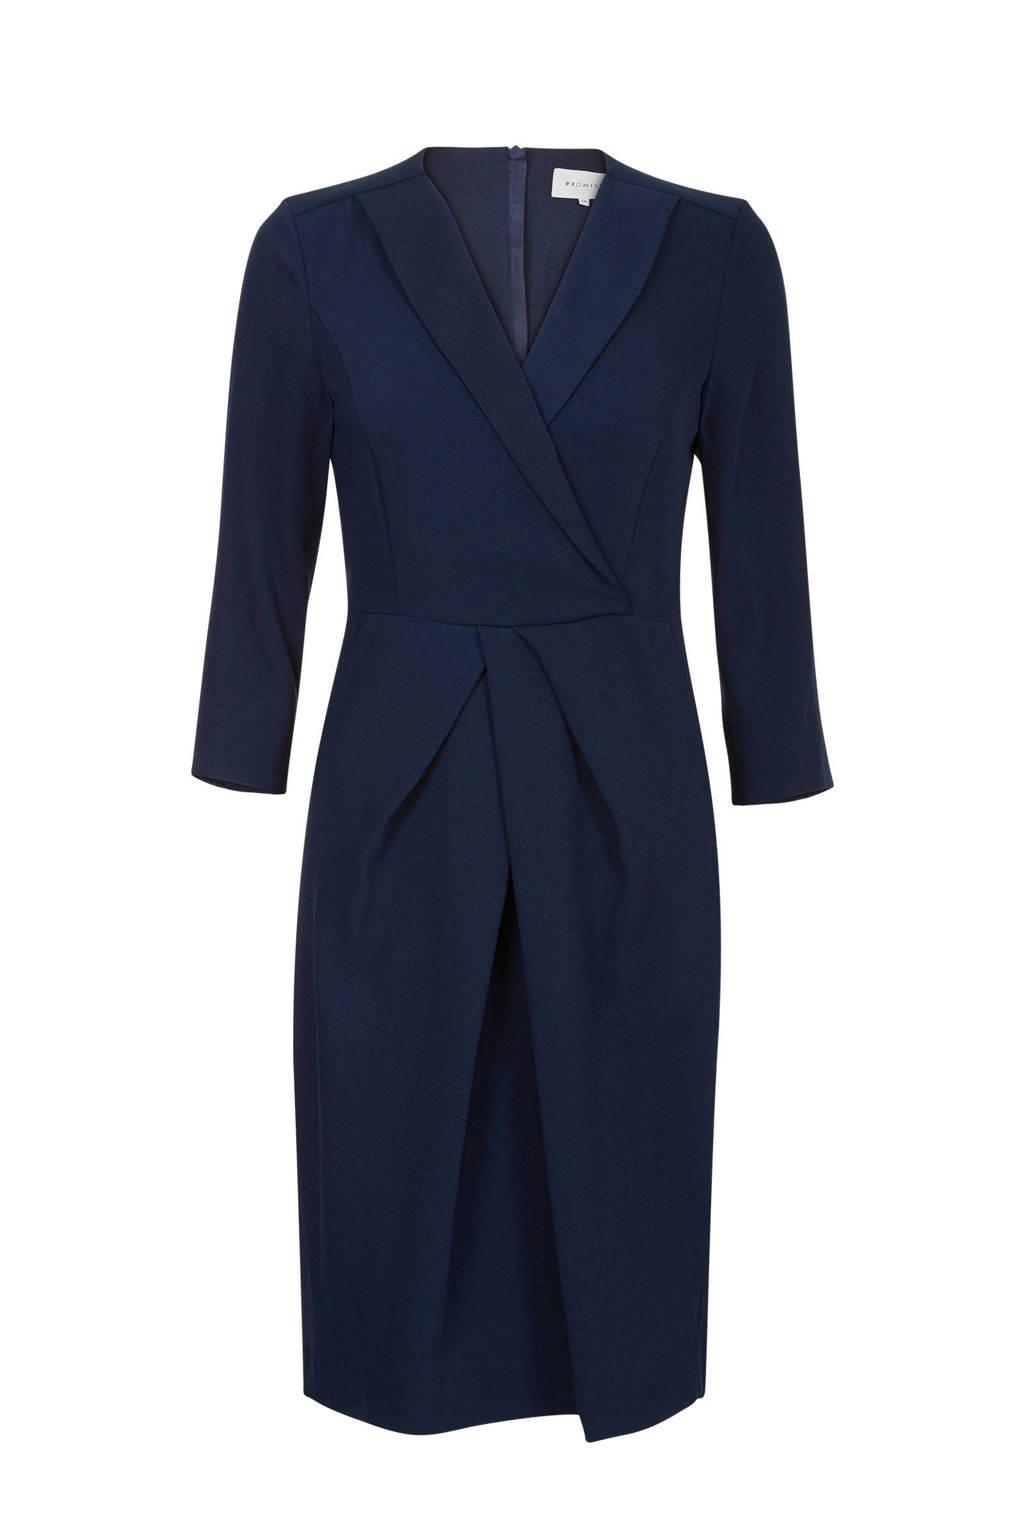 Promiss jurk donkerblauw, Blauw